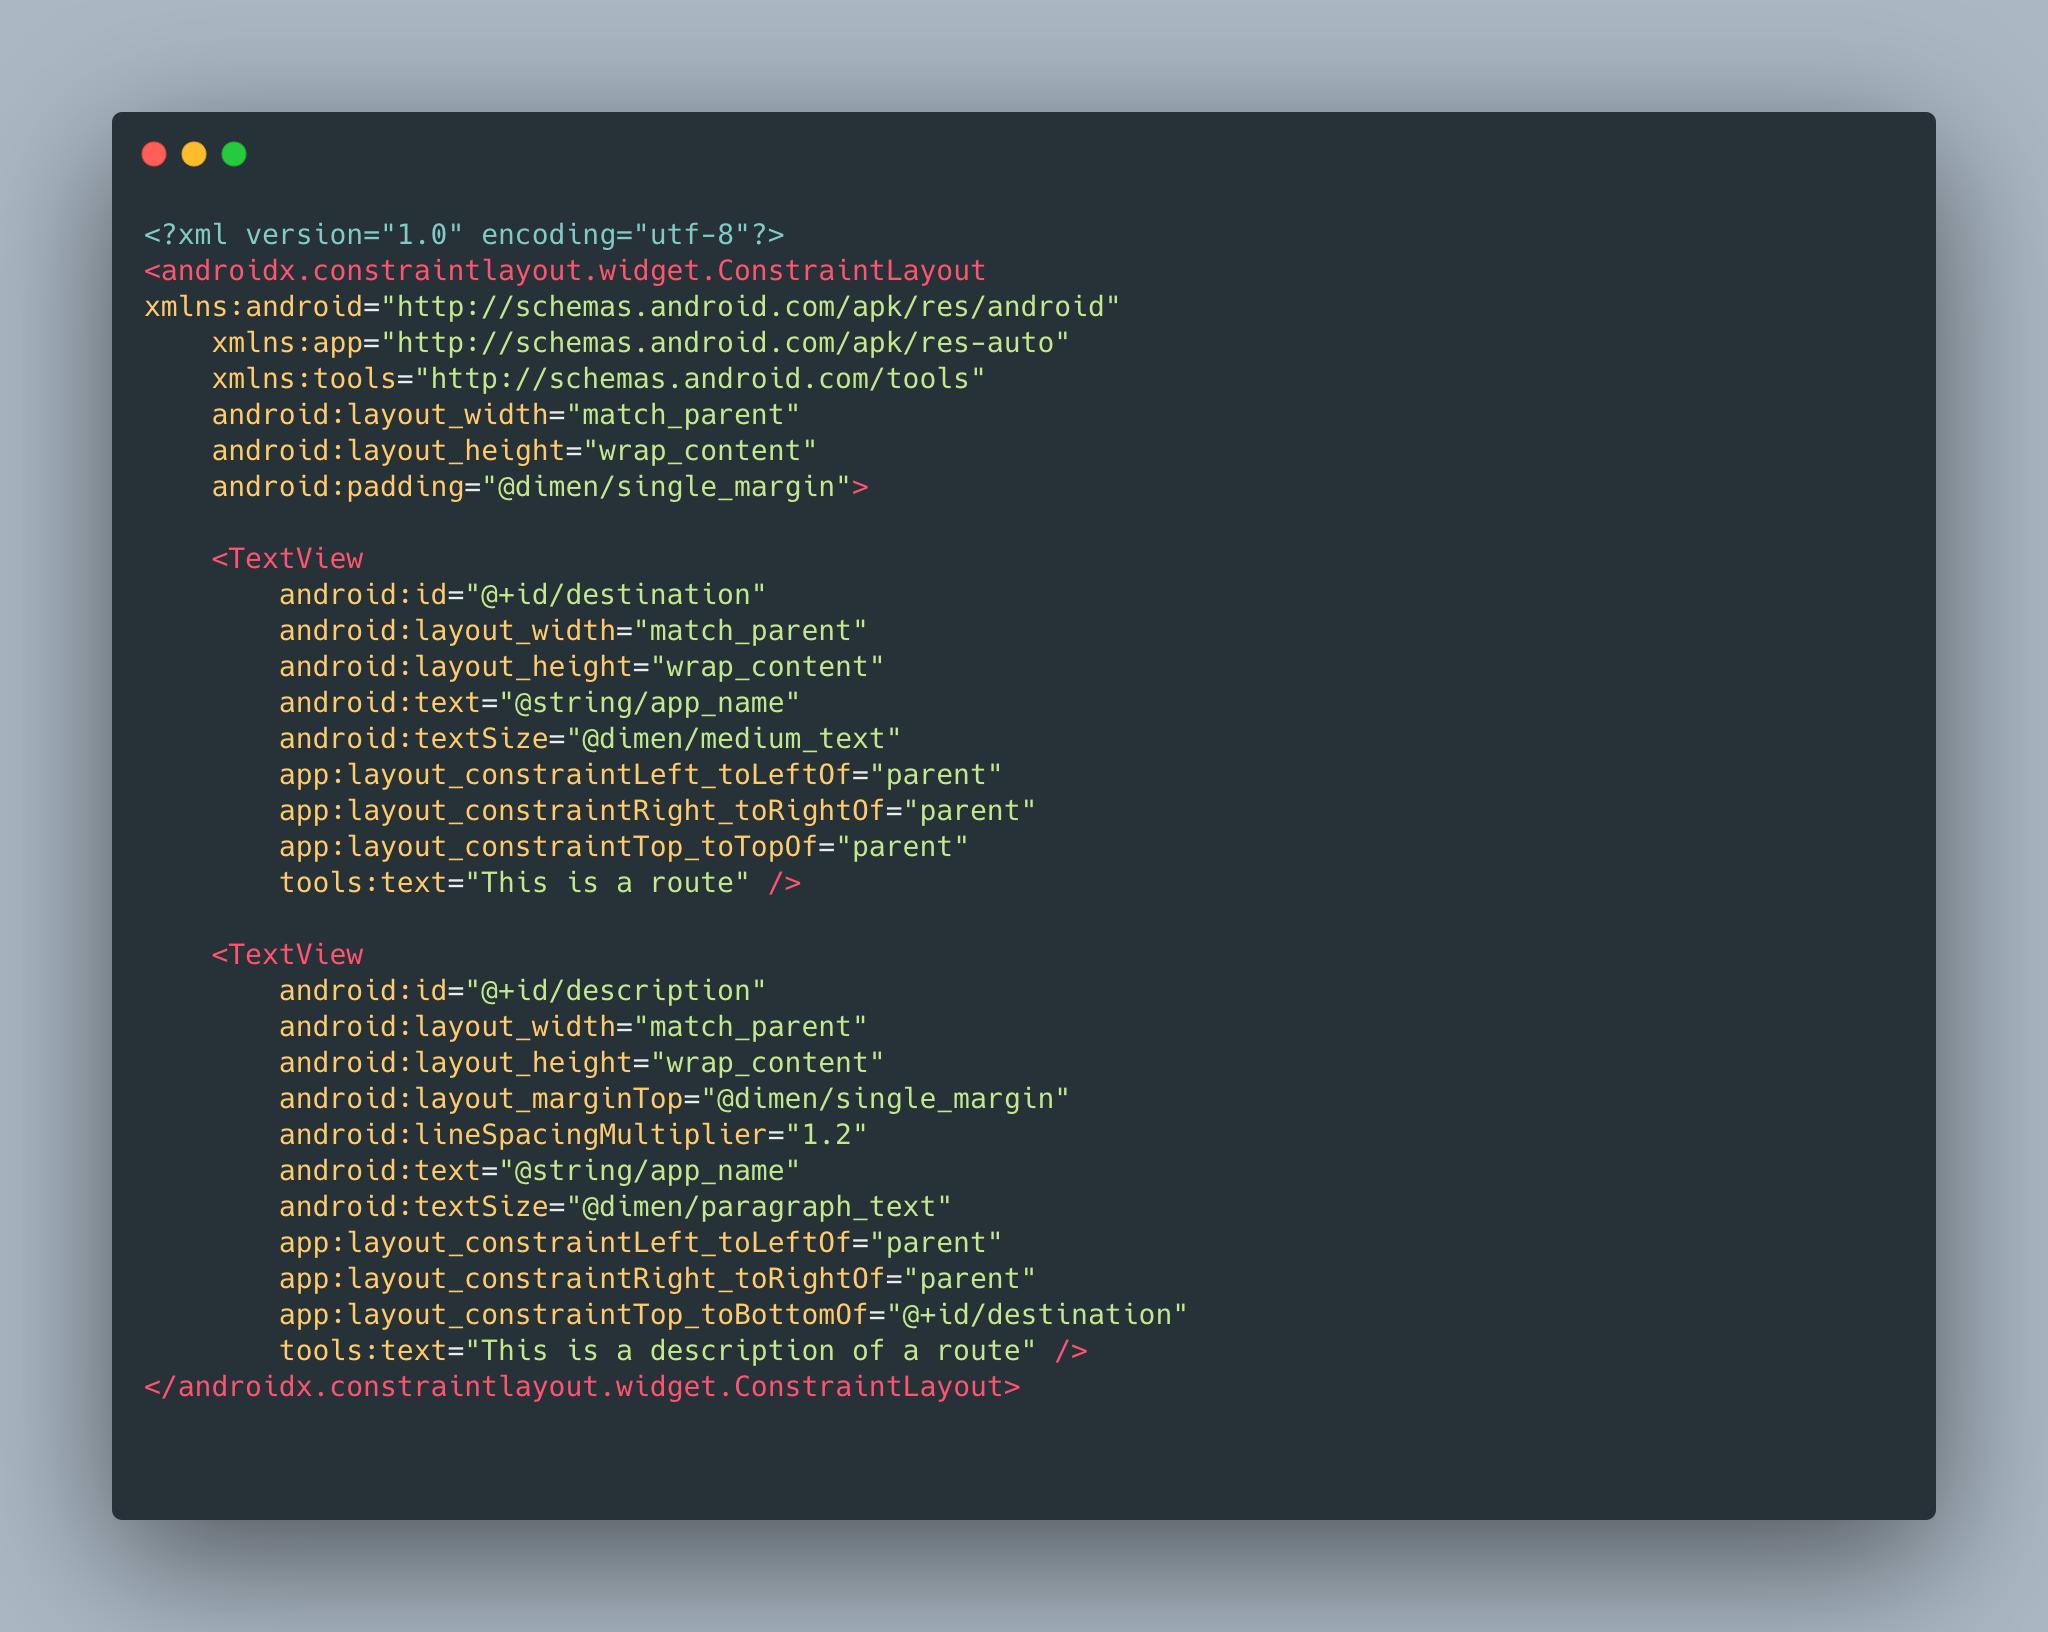 An XML view declaration